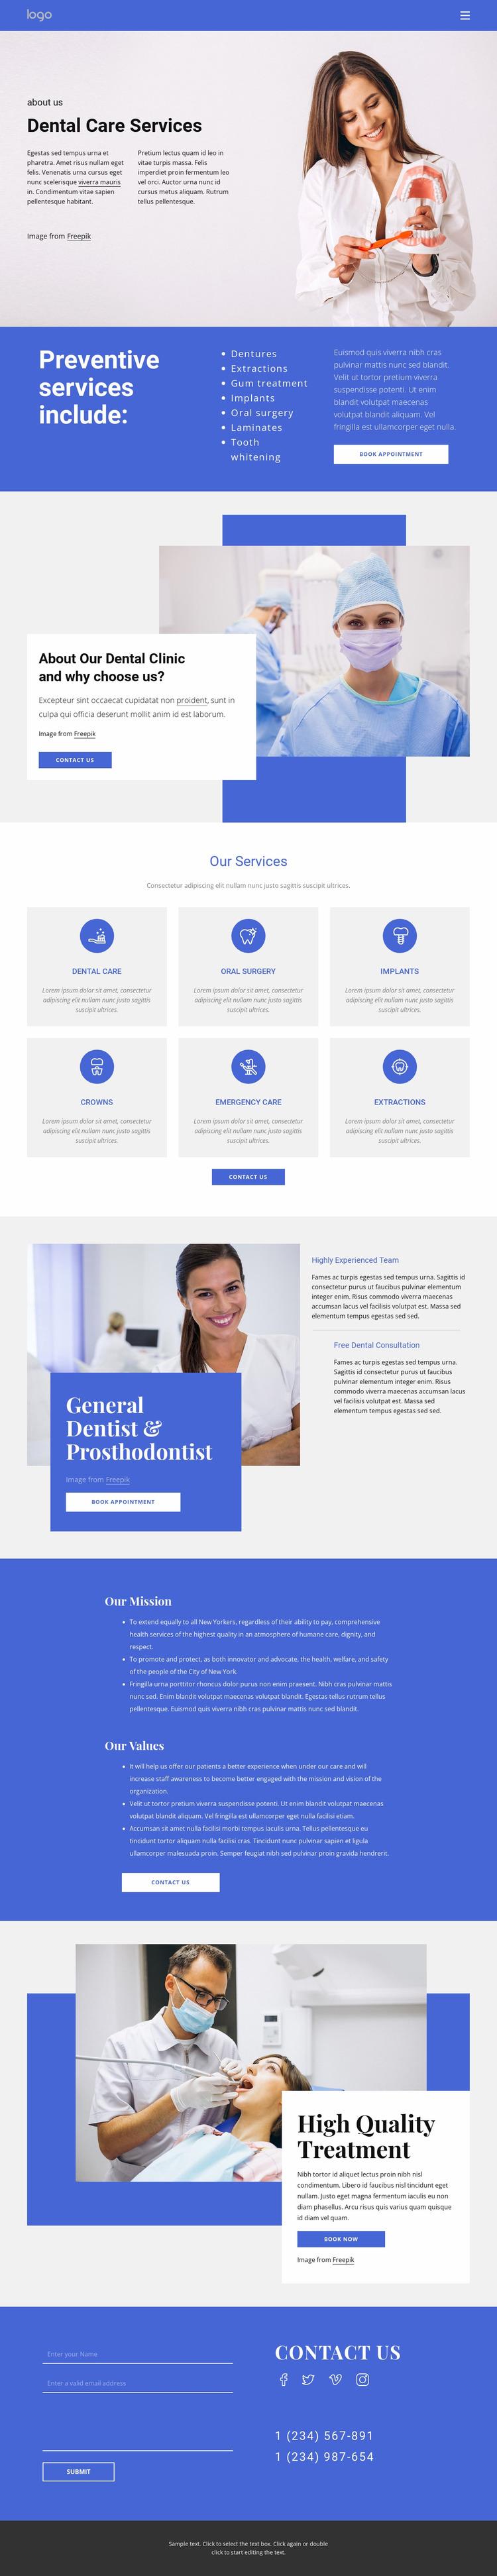 Dentist and prosthodontics Website Mockup